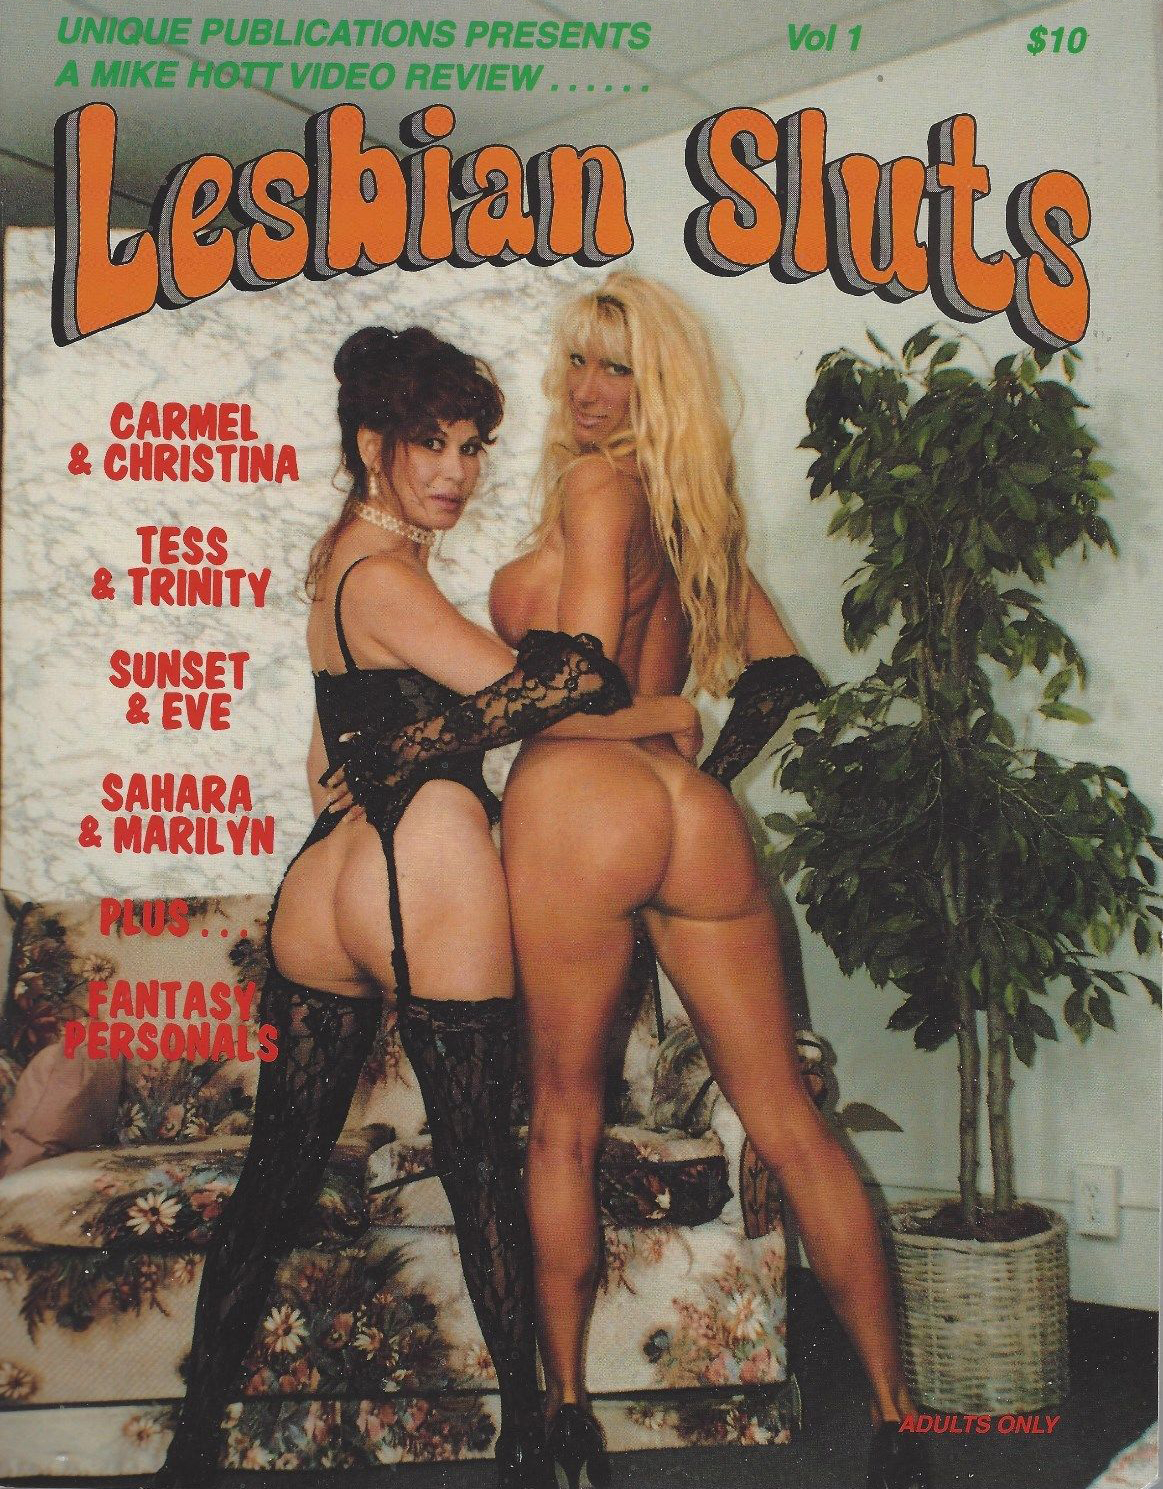 Issue lesbian singles